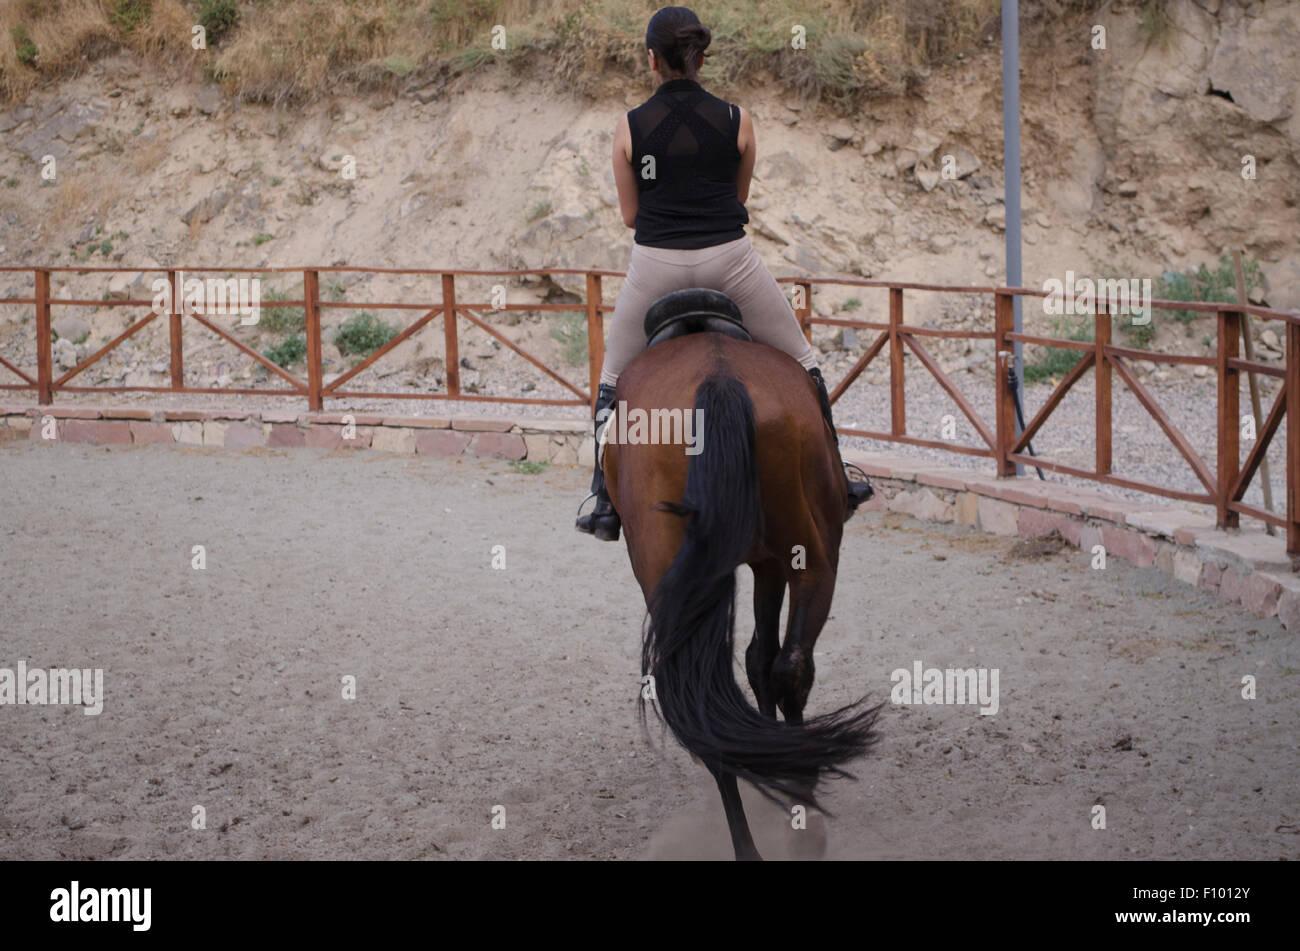 Horsewoman galloping on dark bay horse - Stock Image